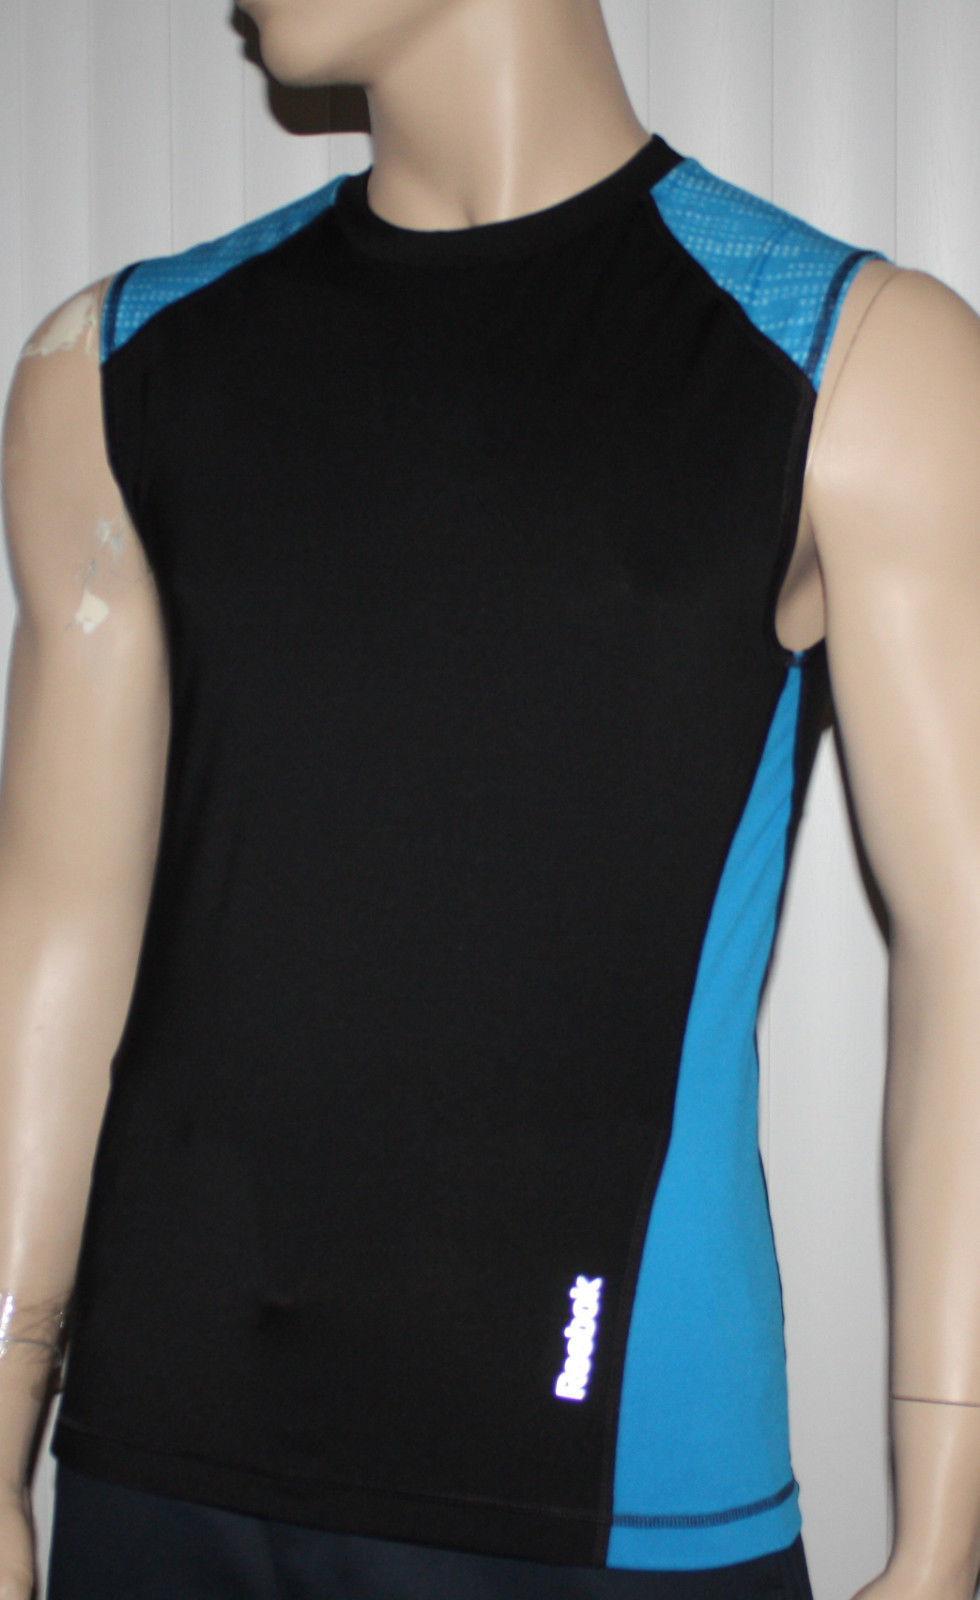 Reebok SPORT Men's Black/Aqua Sleeveless Compression Tank Top (Several Sizes) 10780